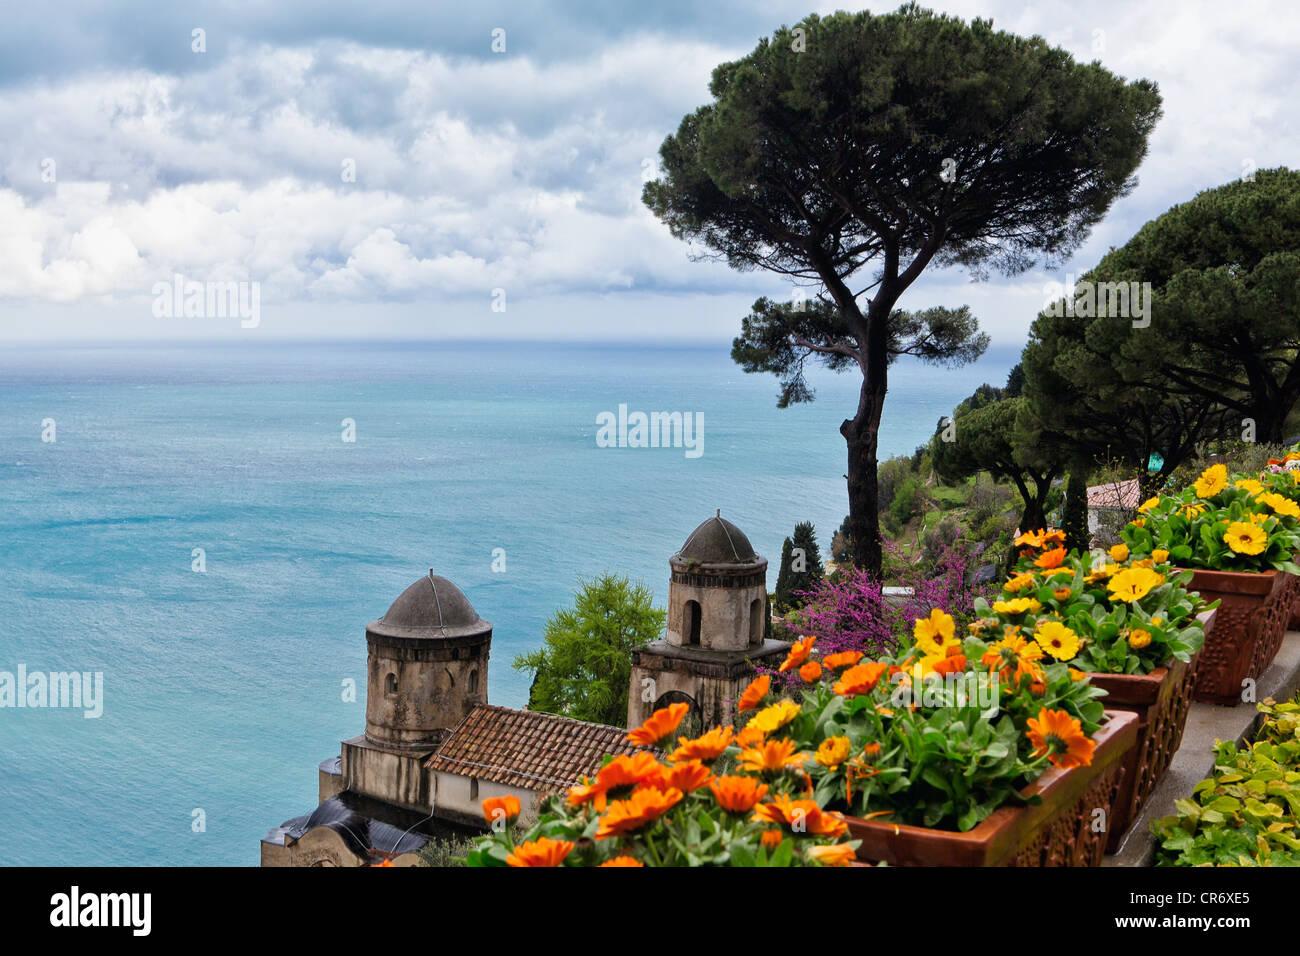 High Angle View from Villa Rufulo, Ravello, Campania, Italy - Stock Image